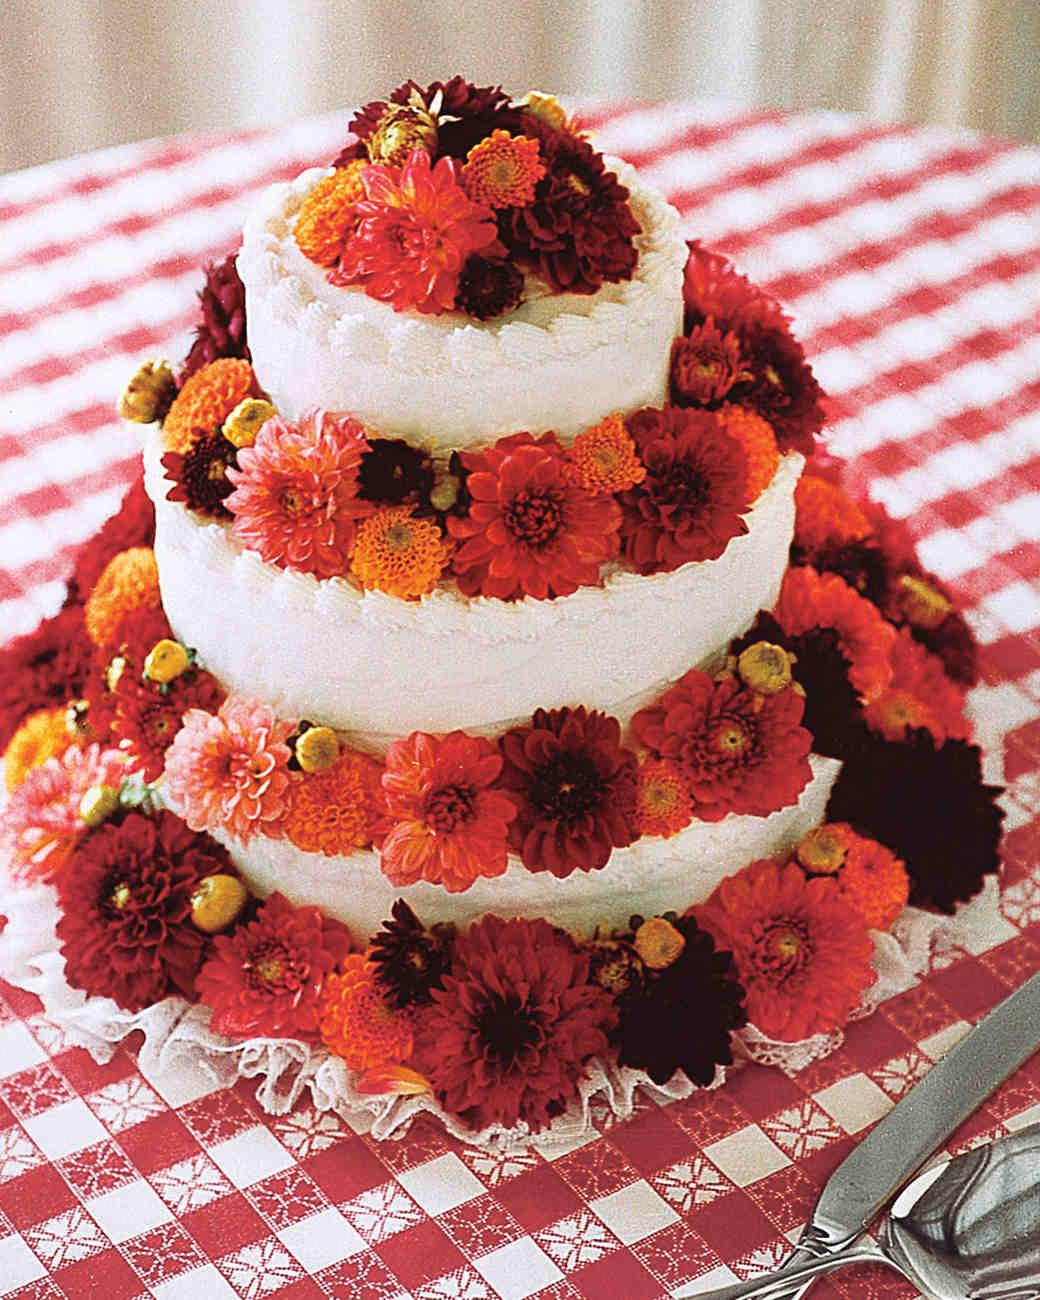 flowers-cake-ma99127.jpg